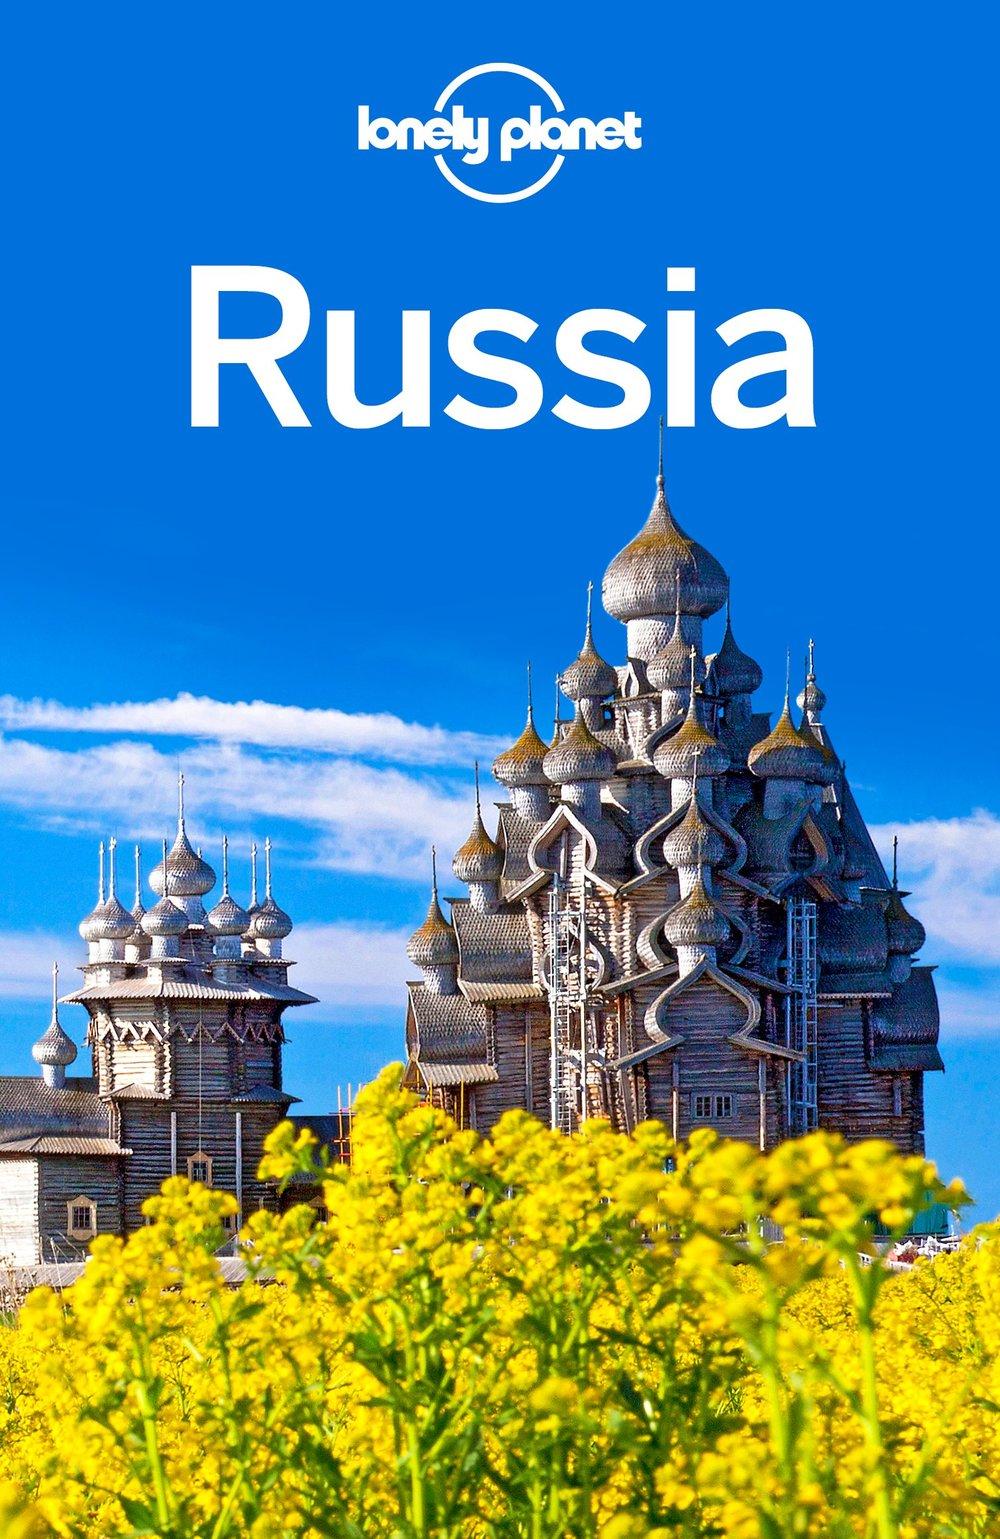 LP_Russia2.jpeg